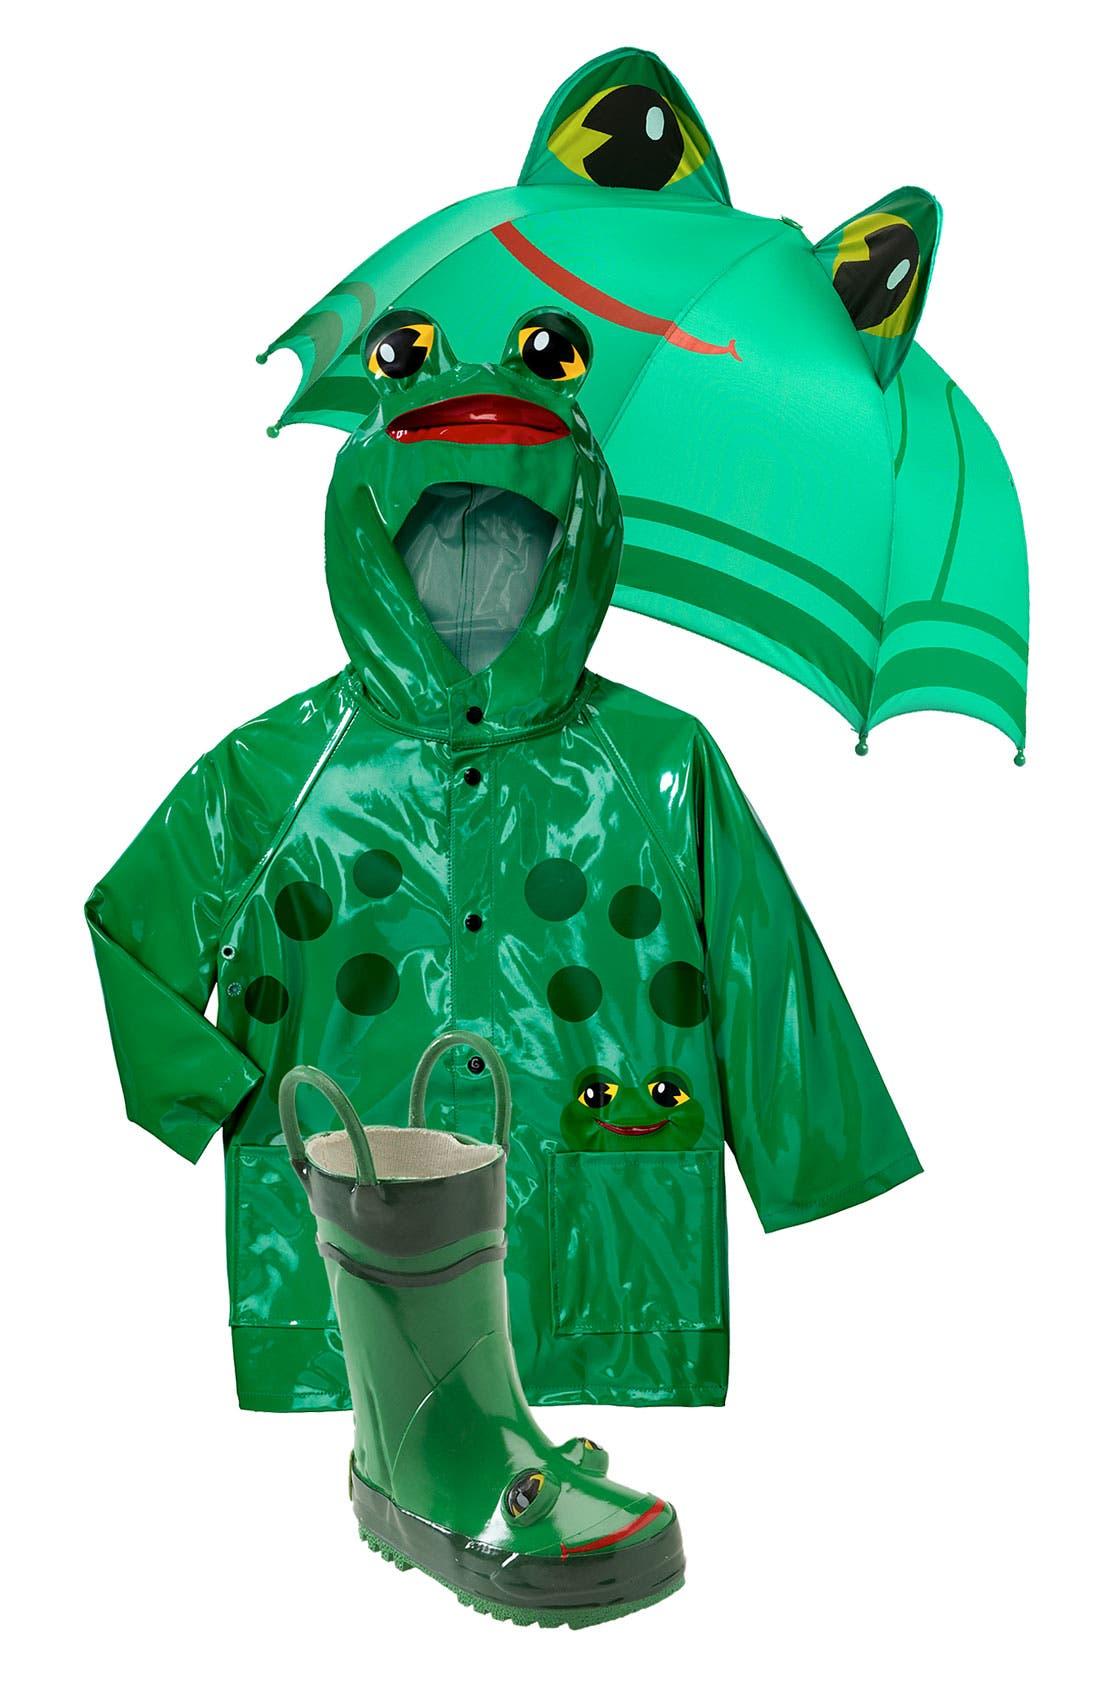 Alternate Image 1 Selected - Western Chief Raincoat, Umbrella & Rain Boot (Toddler & Little Kid)